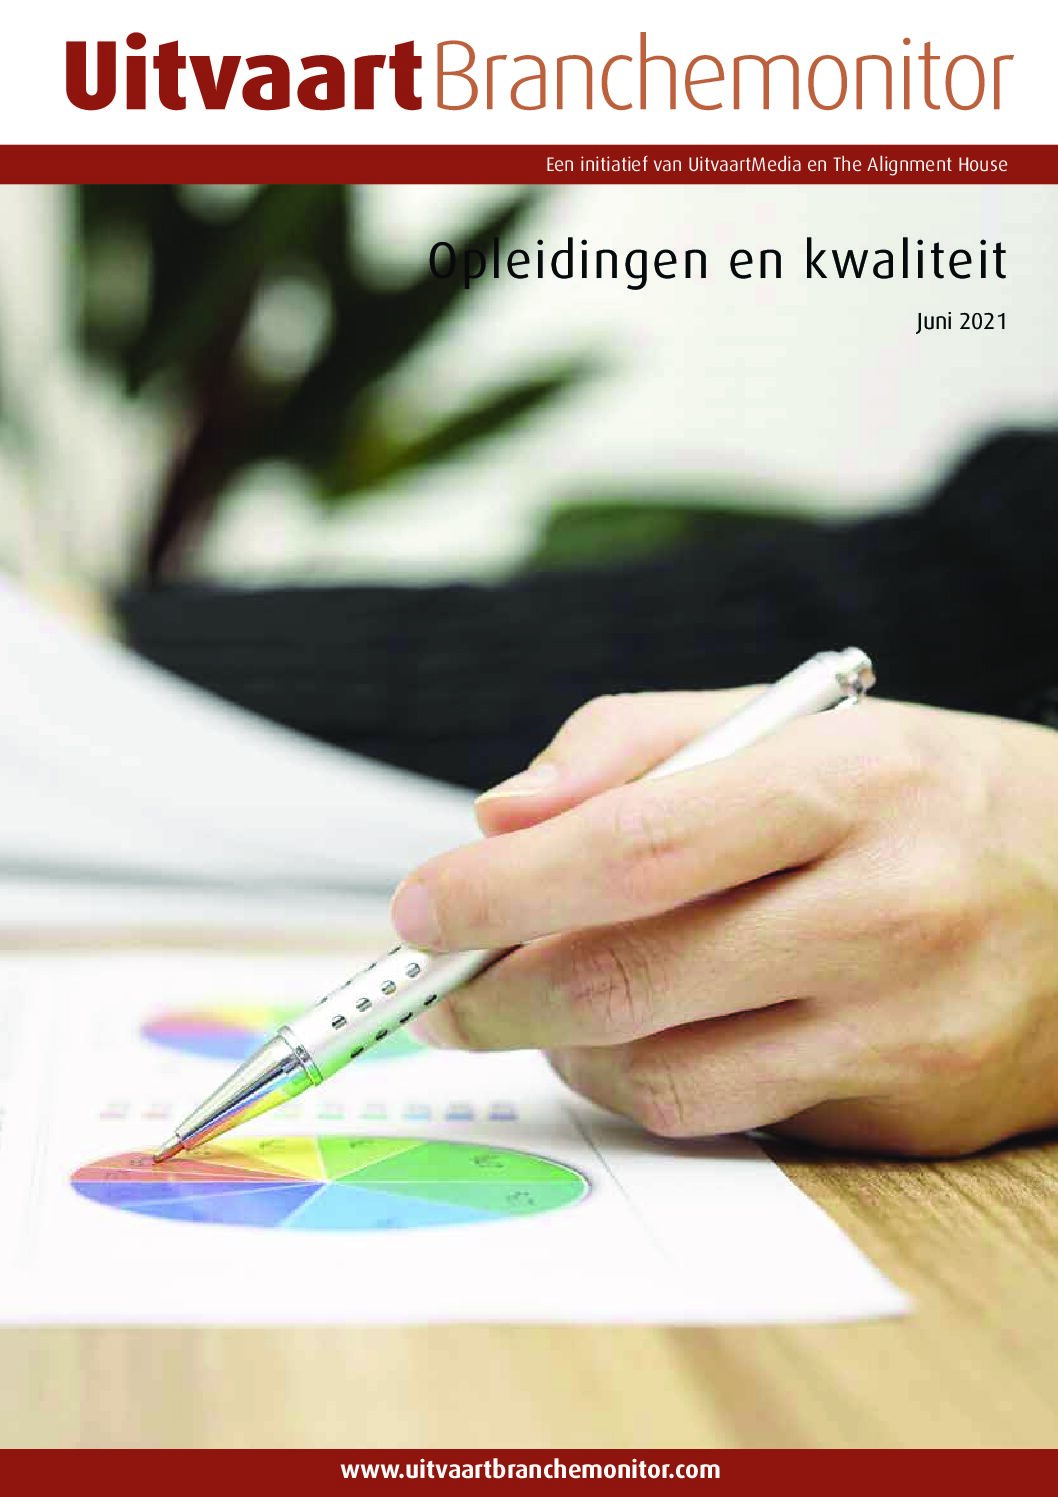 Download UitvaartBranchemonitor Opleidingen en kwaliteit juni 2021 (pdf)